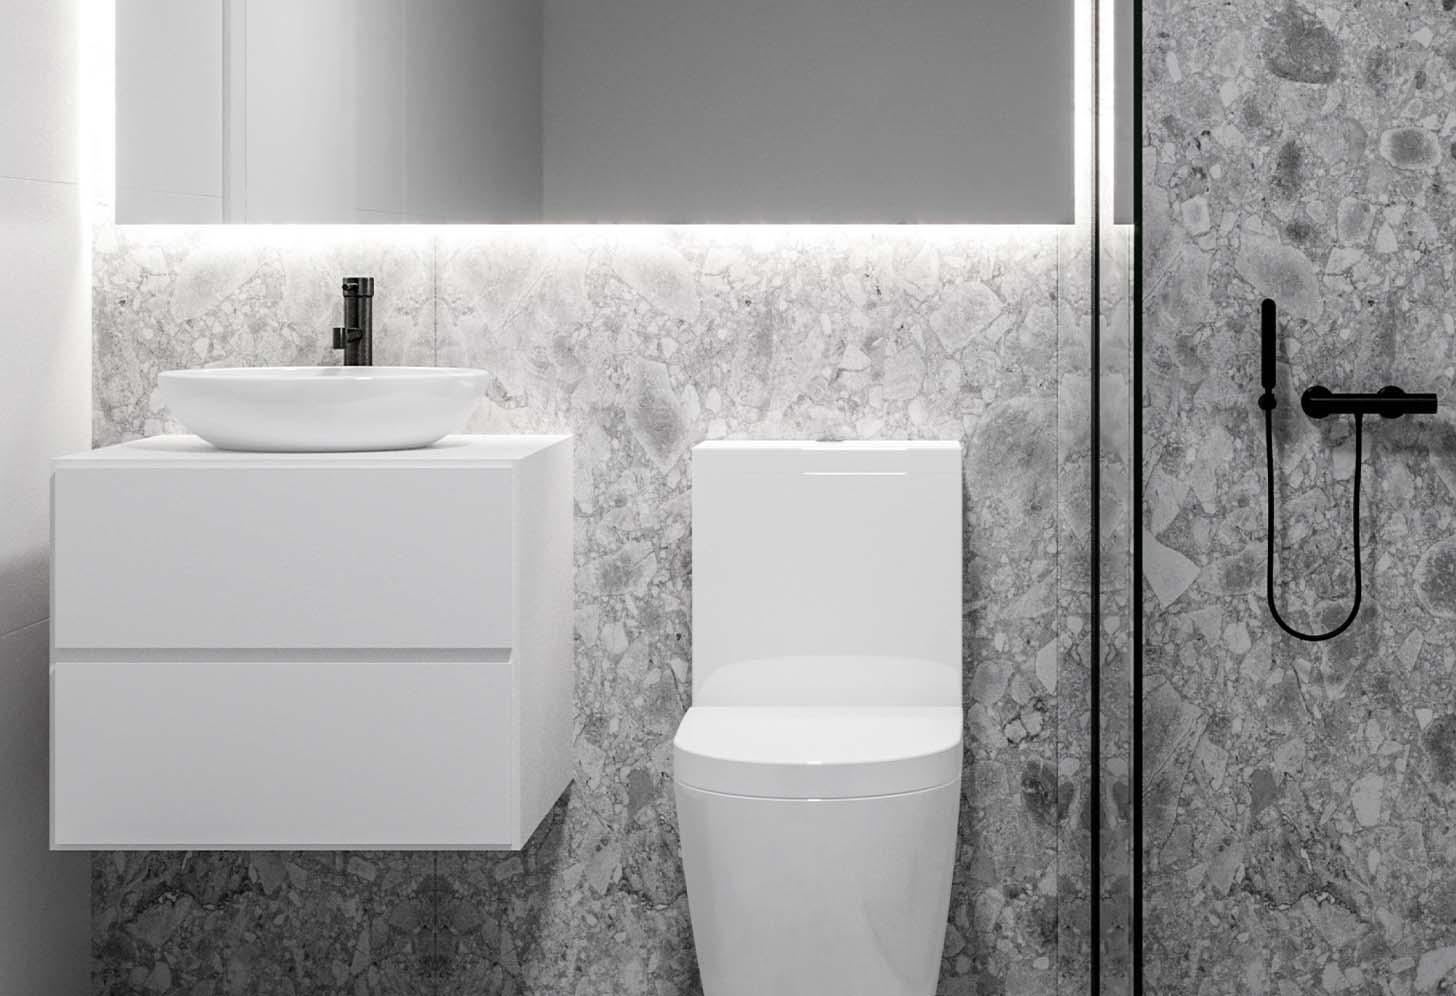 immobilier neuf espagne costa blanca on-a4 san vicente salle de bain